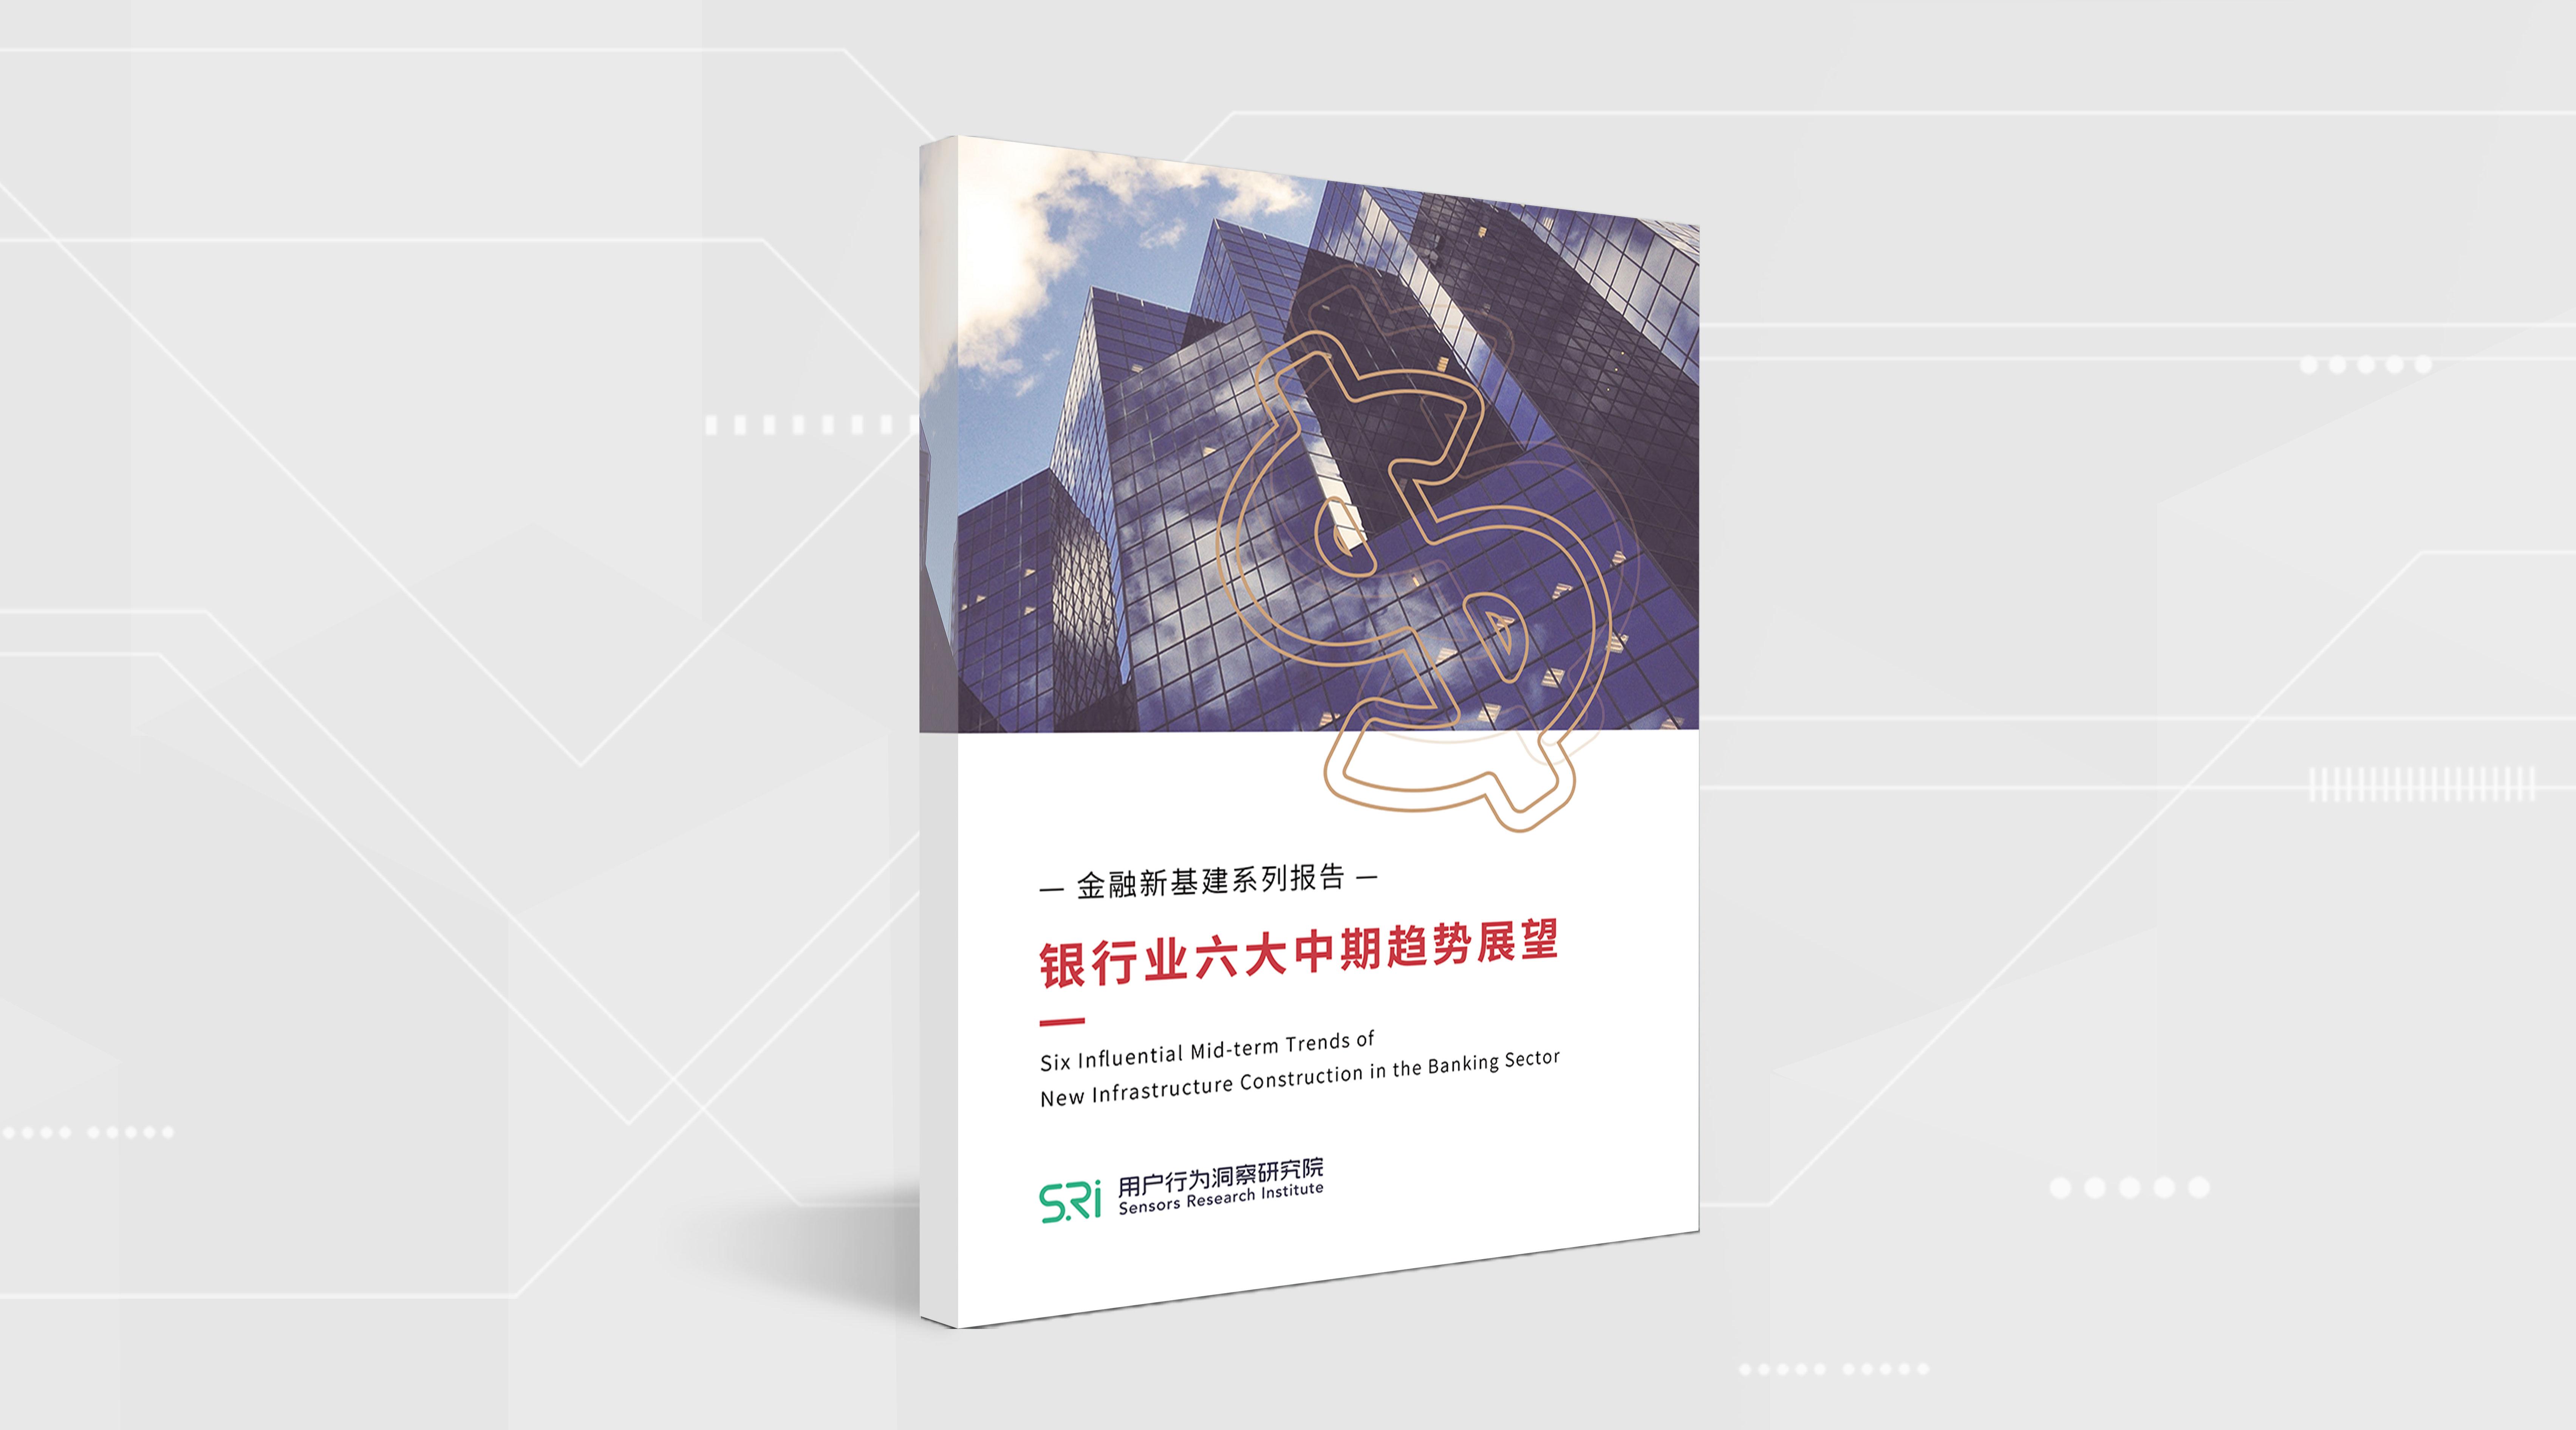 56e92972beff6958c8d6581ede4c9b77.pdf